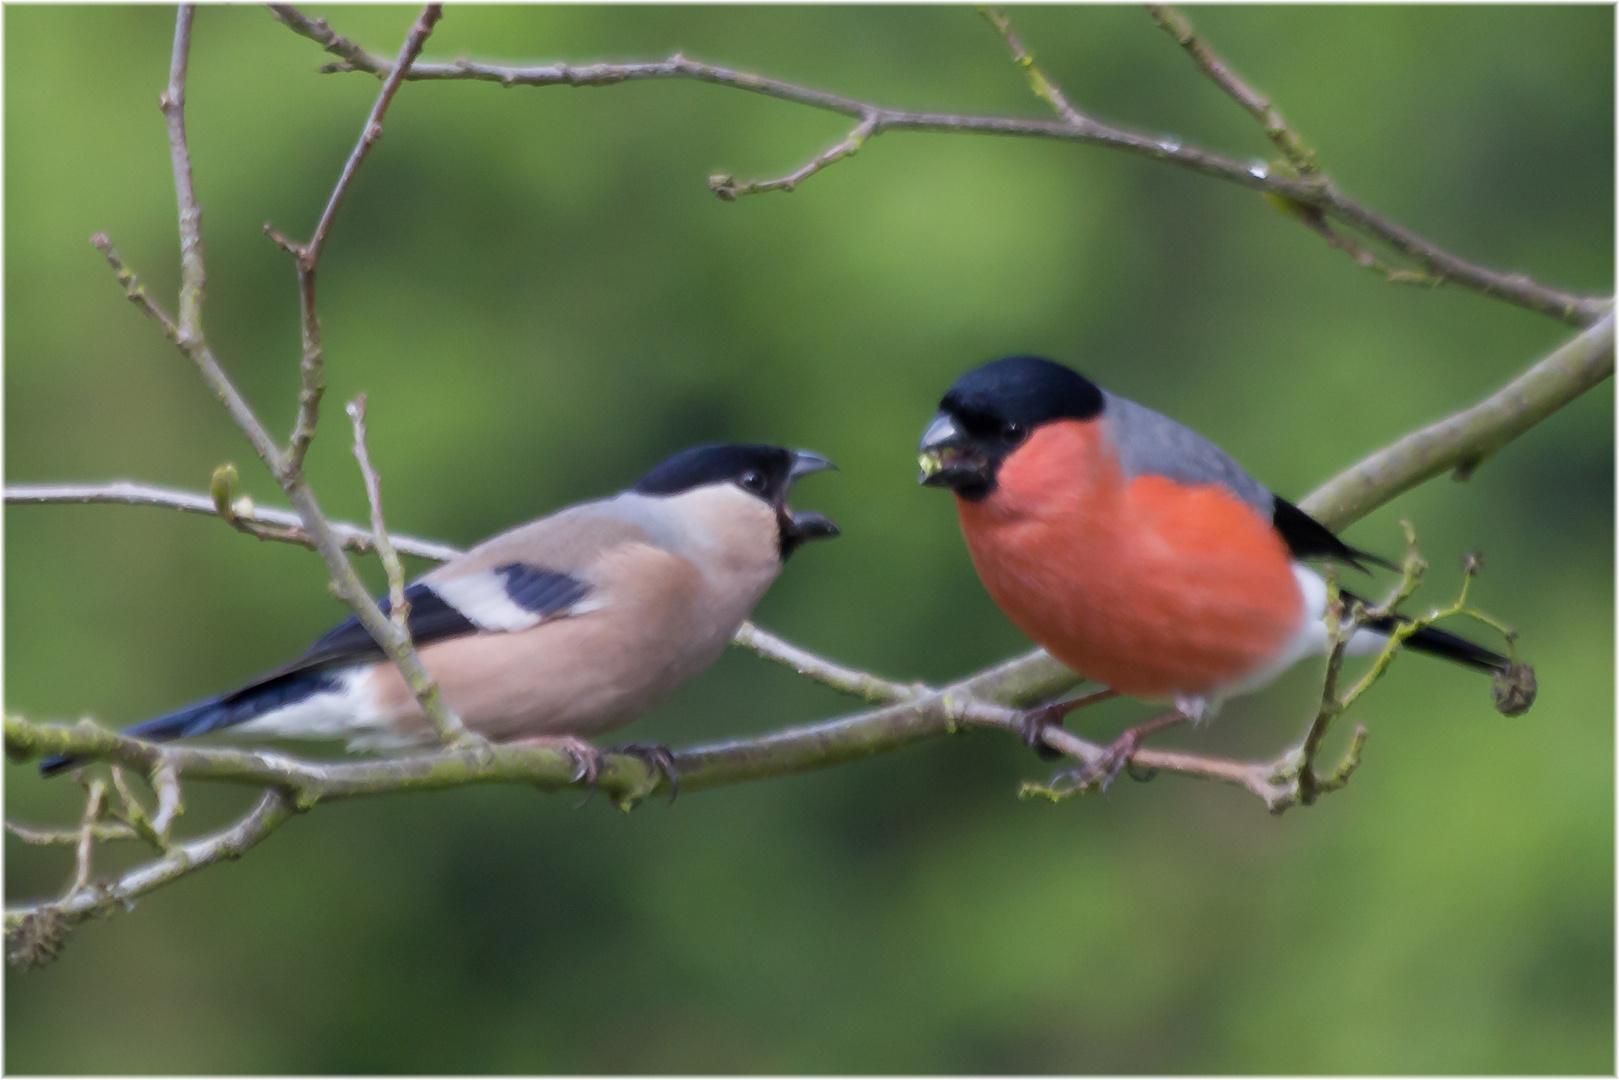 Gimpel Life Foto & Bild  natur, tiere, vögel Bilder auf fotocommunity